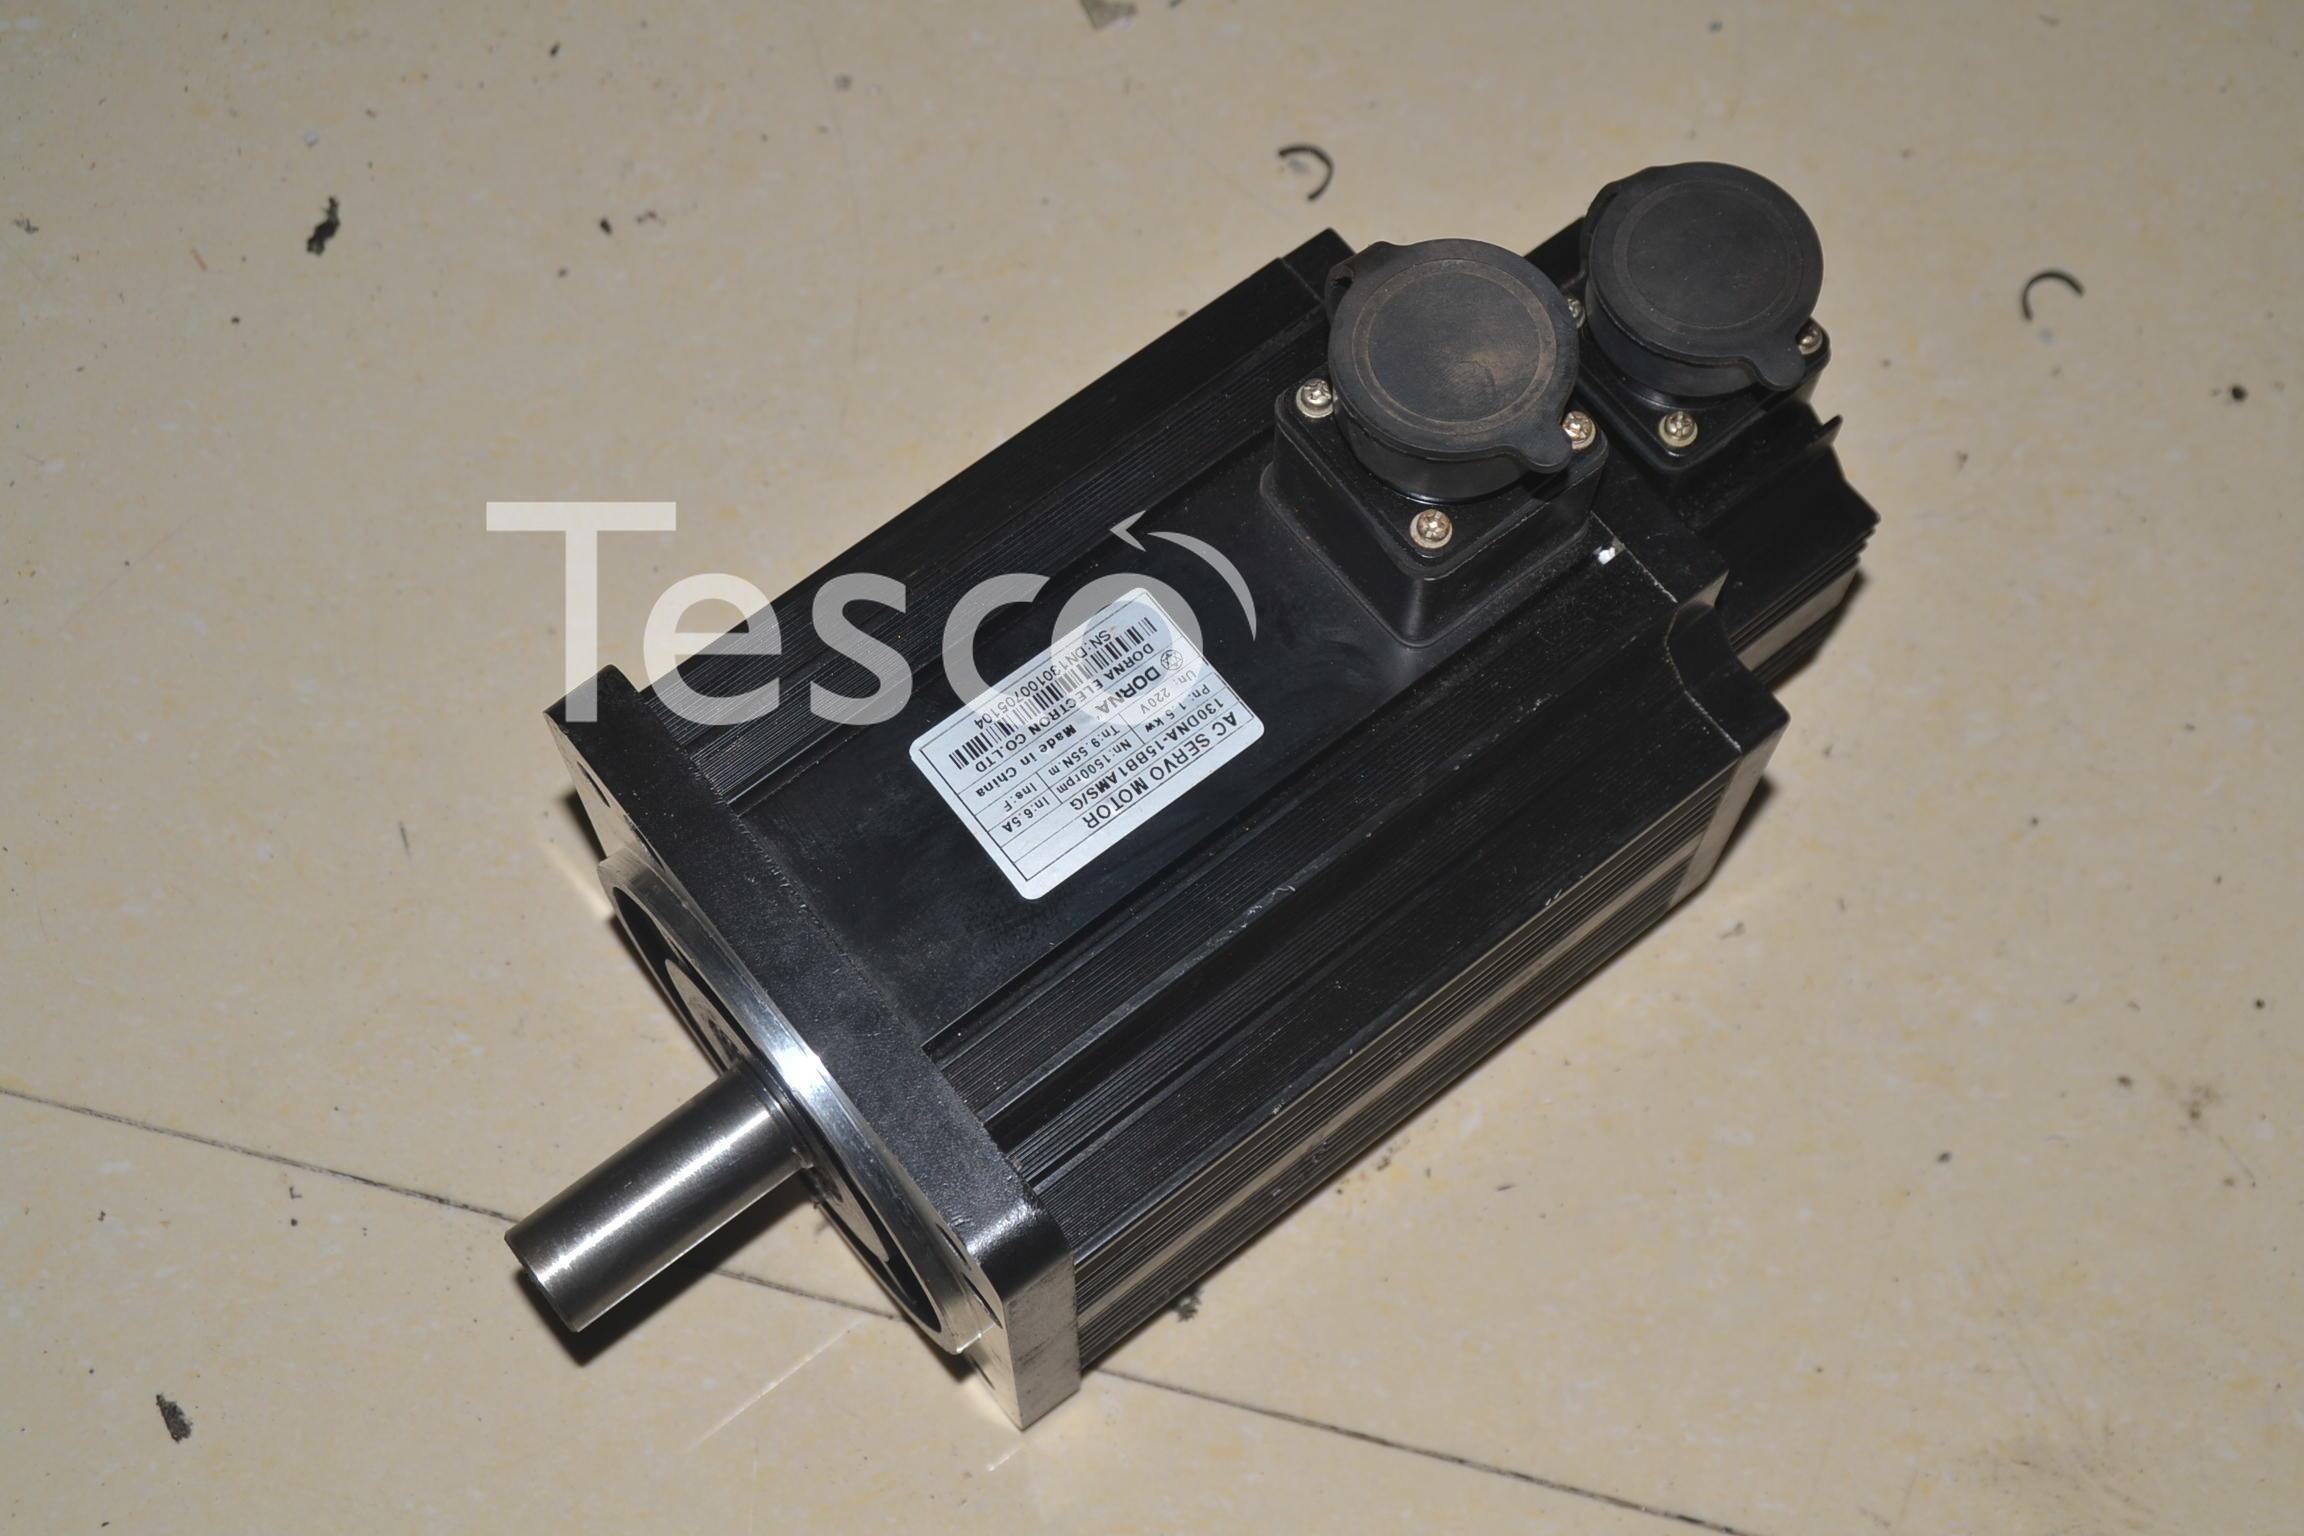 130DNA-15BB1AMS / G 1,5 KW 9,55 NM 1500 rpm 130 servo motor